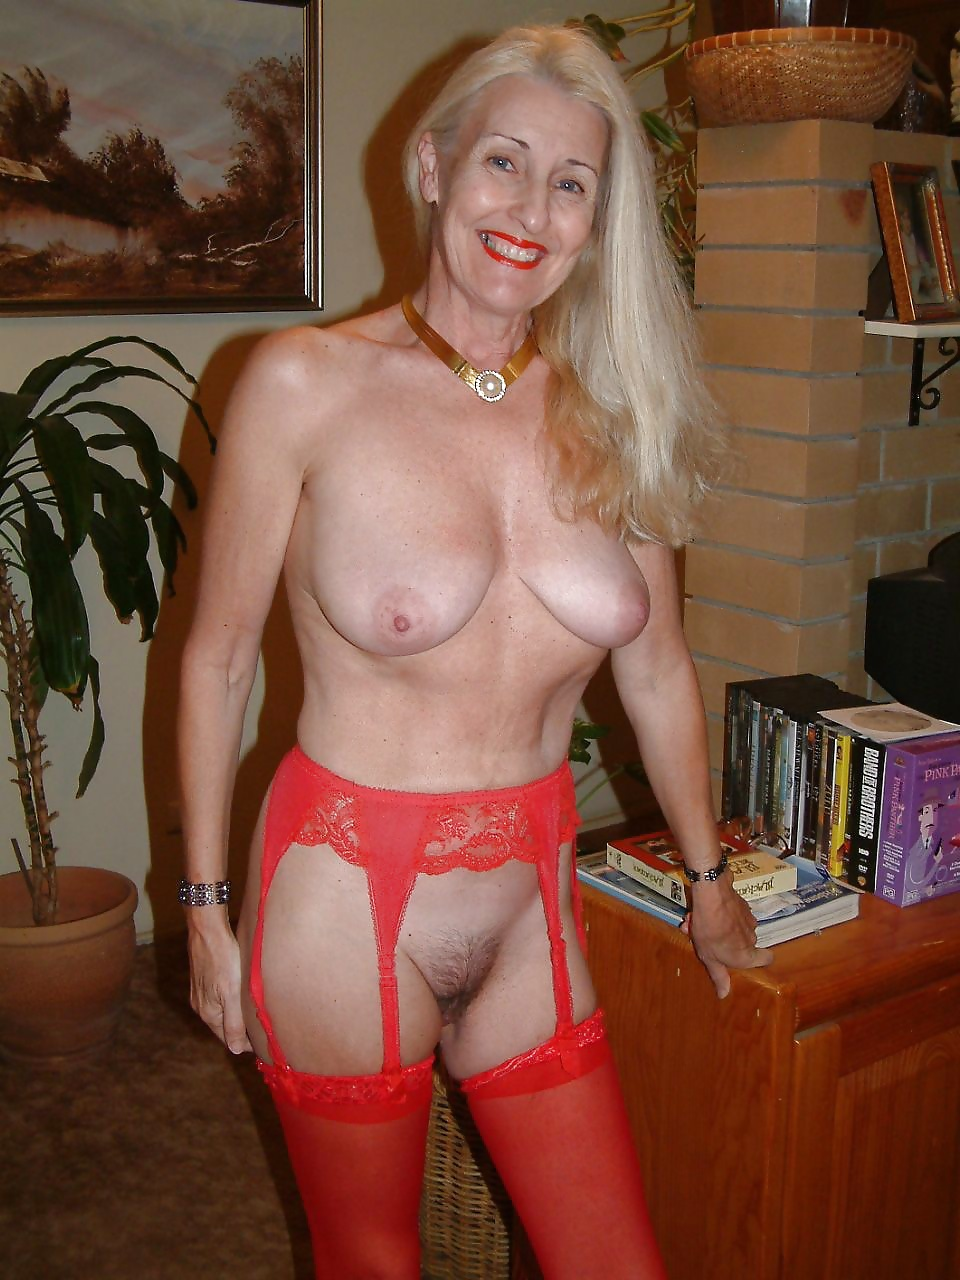 fantastic matures: horny grannies in stockings 03